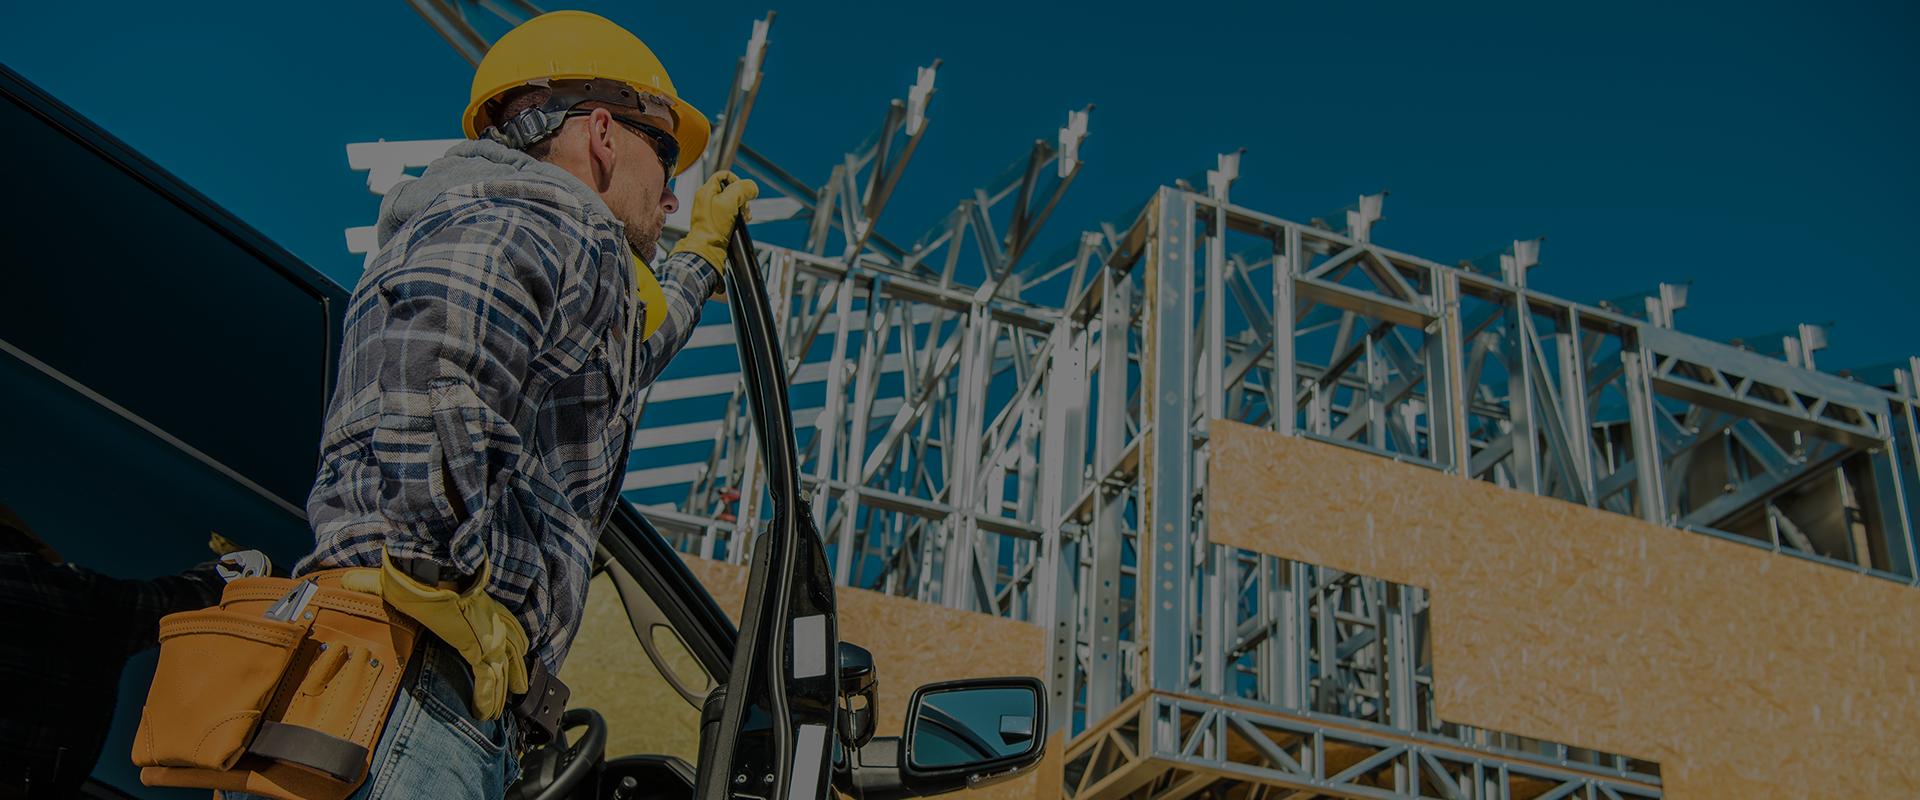 Commercial Auto Program for Artisan Contractors